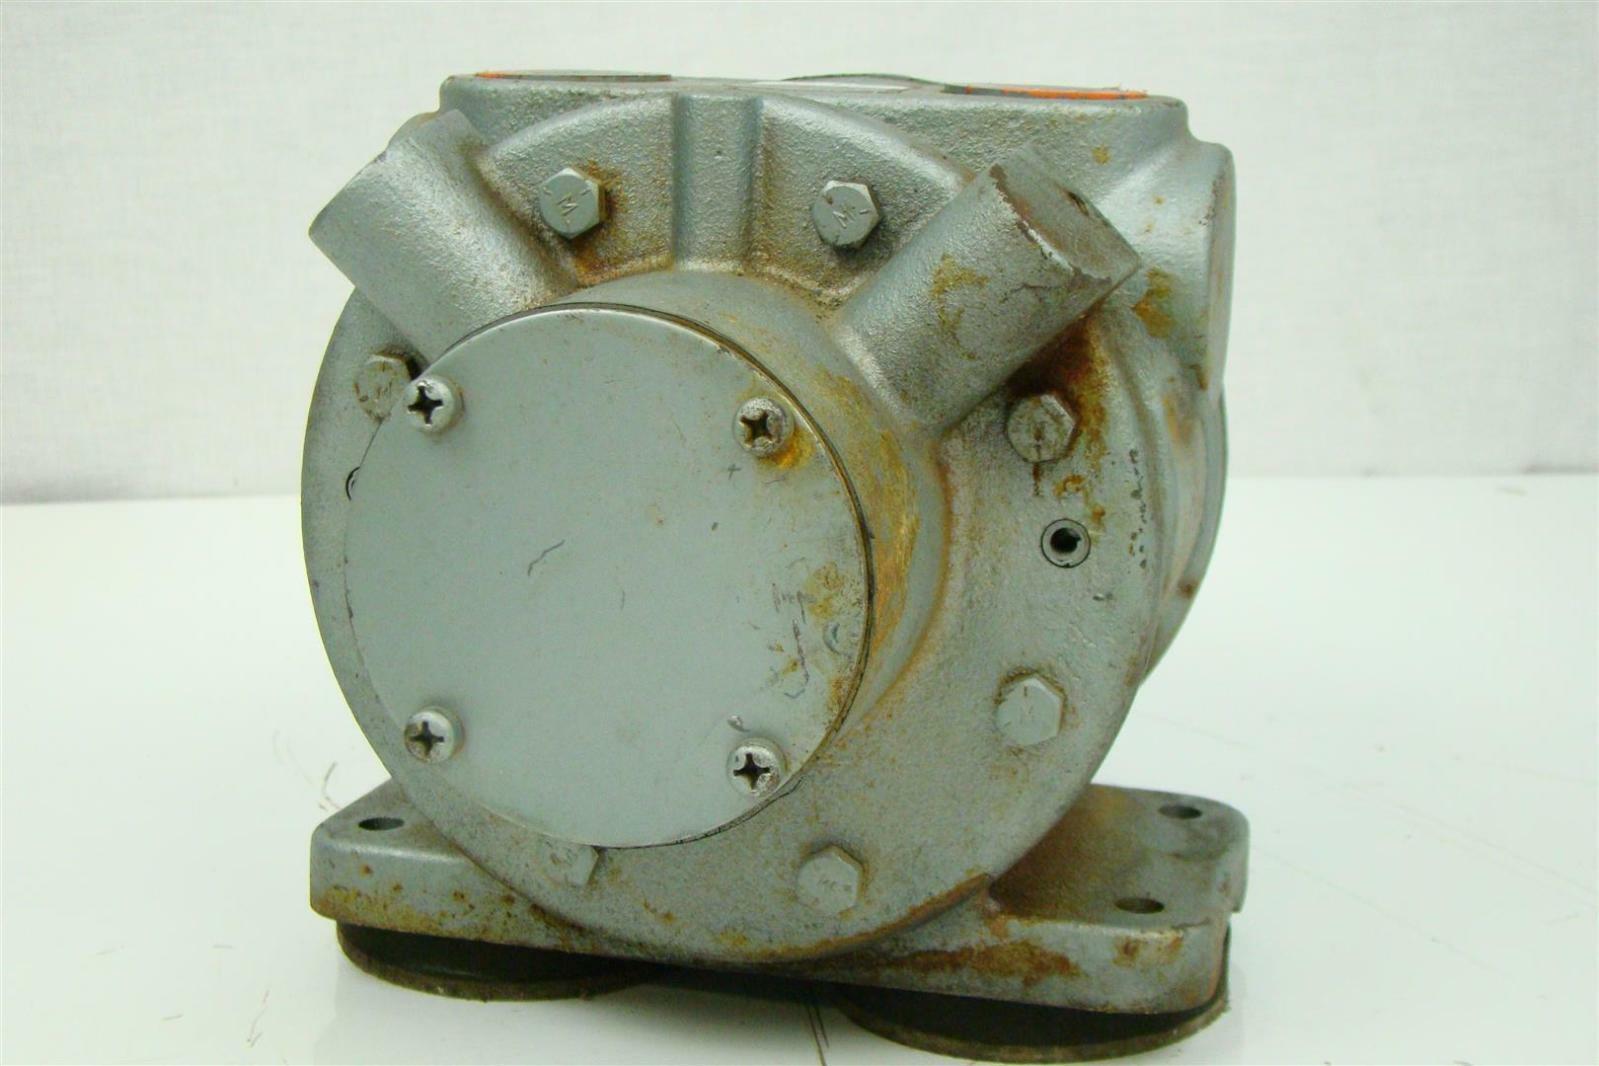 Gast Air Motor 9 5 Hp 2 000 Rpm 275 Cfm 1186 16am Frv 2 Ebay